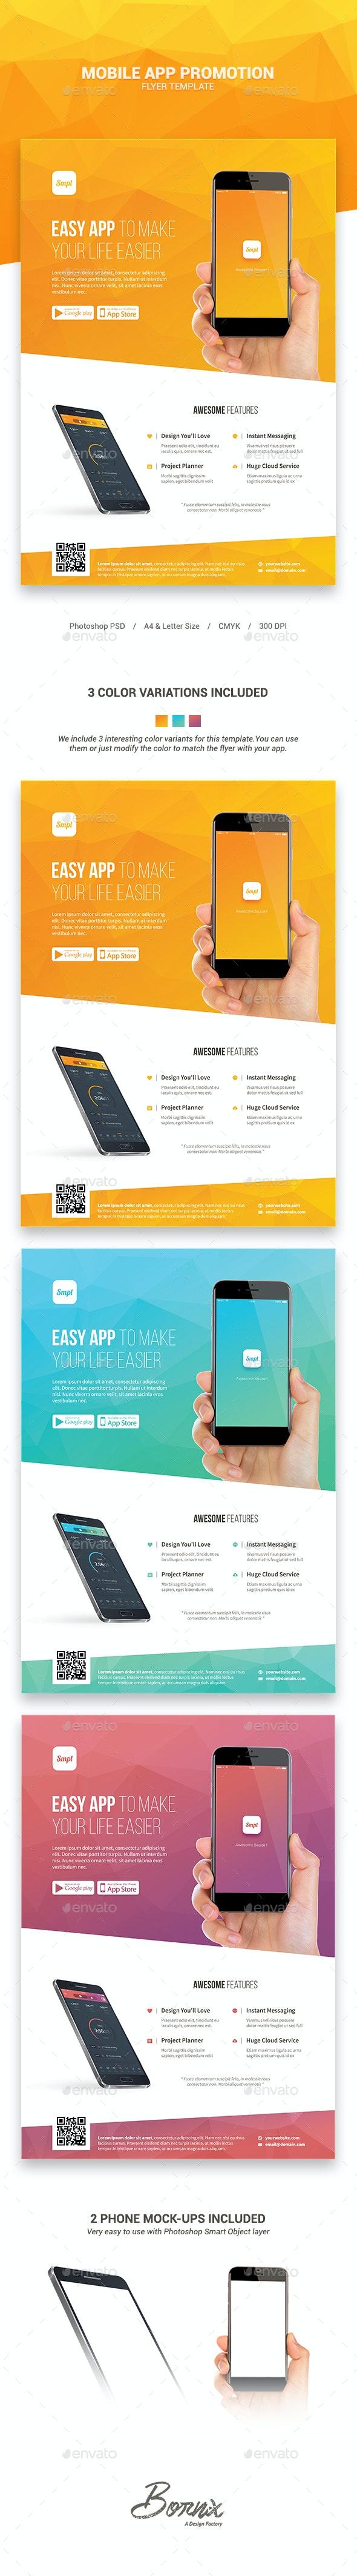 Mobile App Promotion Flyer Template - Commerce Flyers